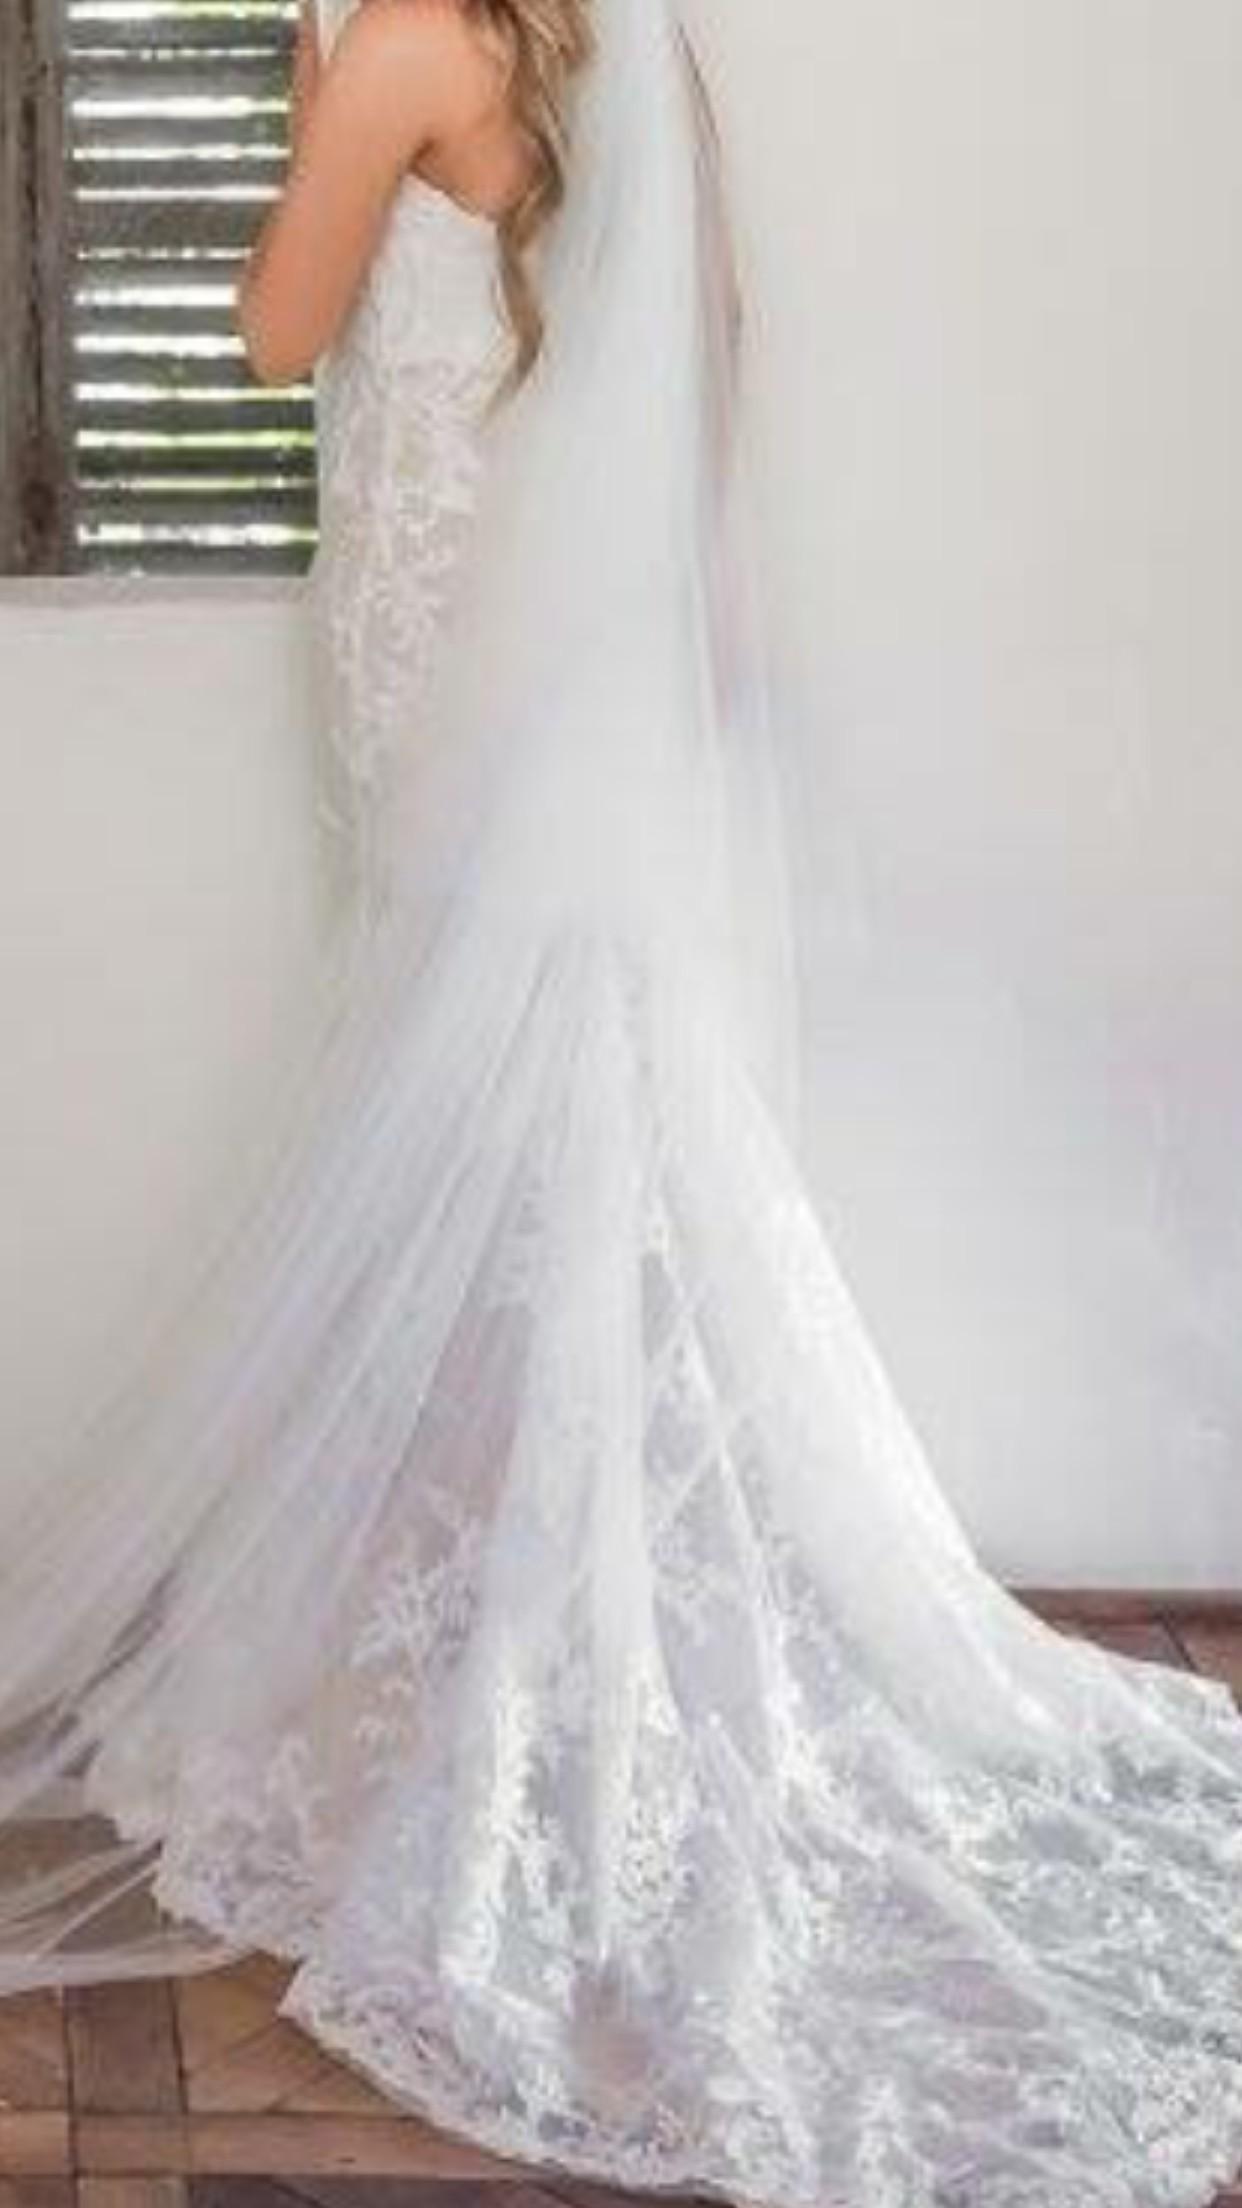 b7d3ed52c89 Nektaria Giselle Gown Second Hand Wedding Dress on Sale 39% Off -  Stillwhite Australia